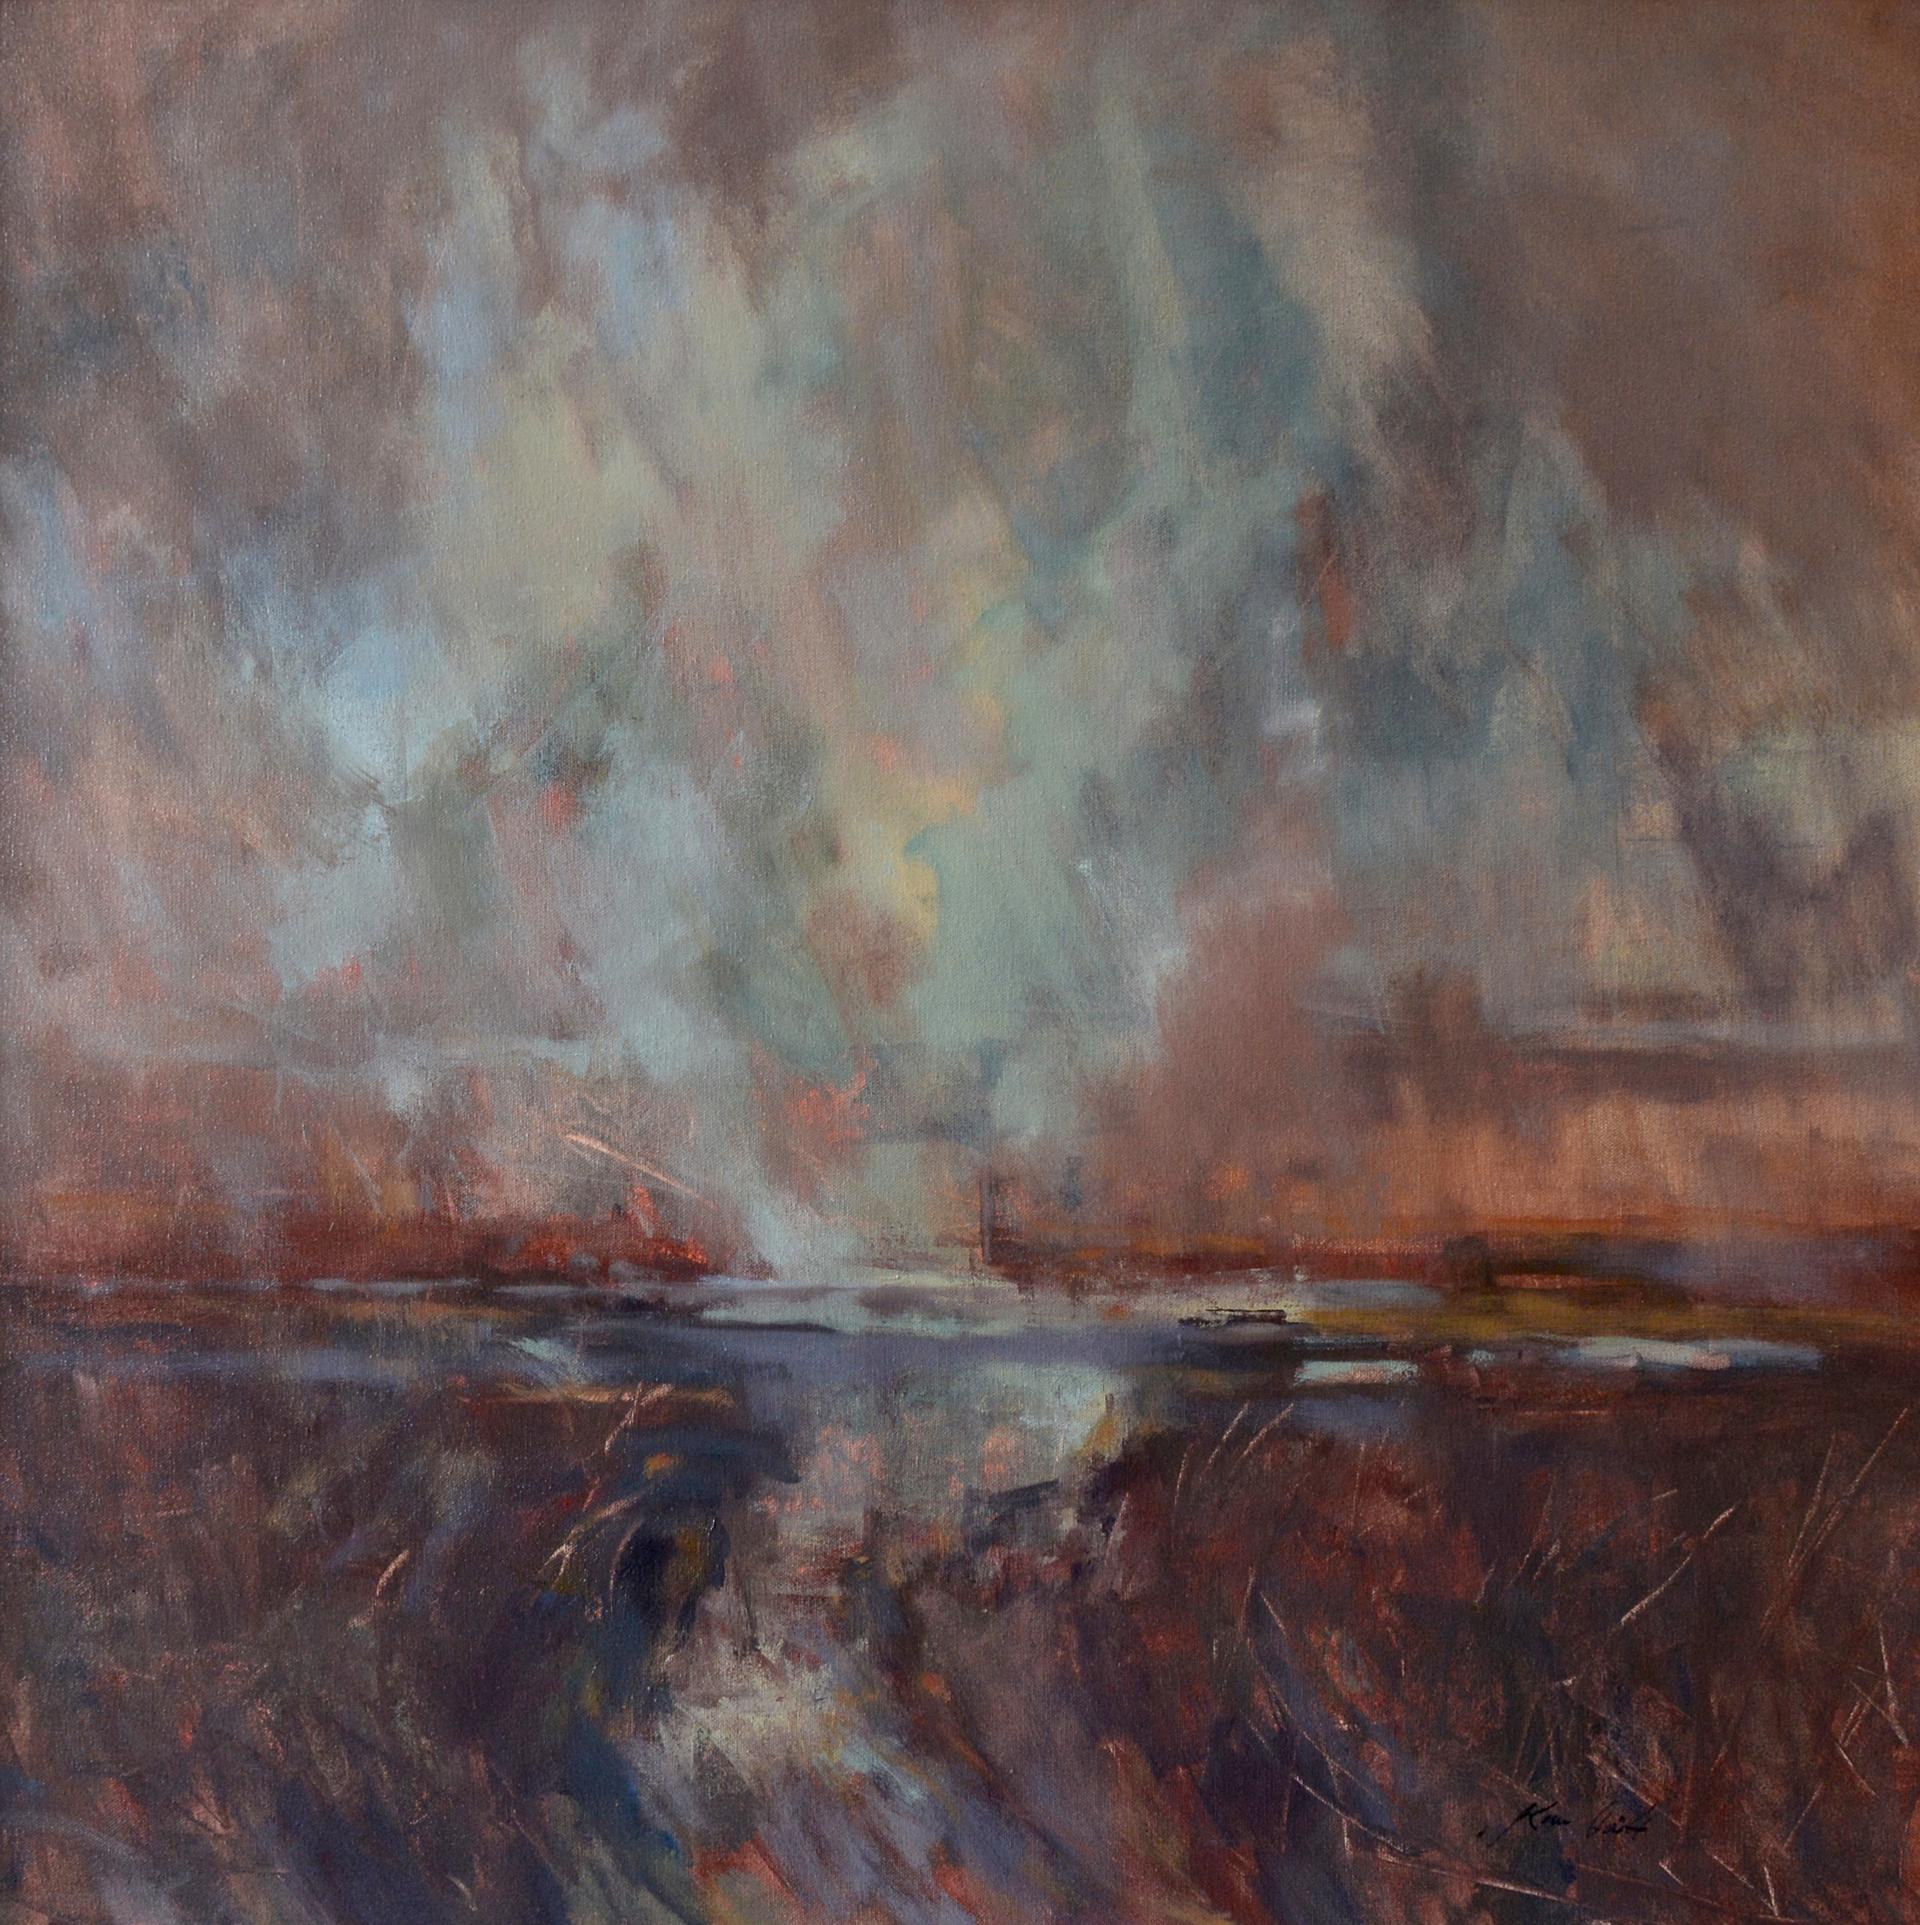 Just After the Storm by Karen Hewitt Hagan